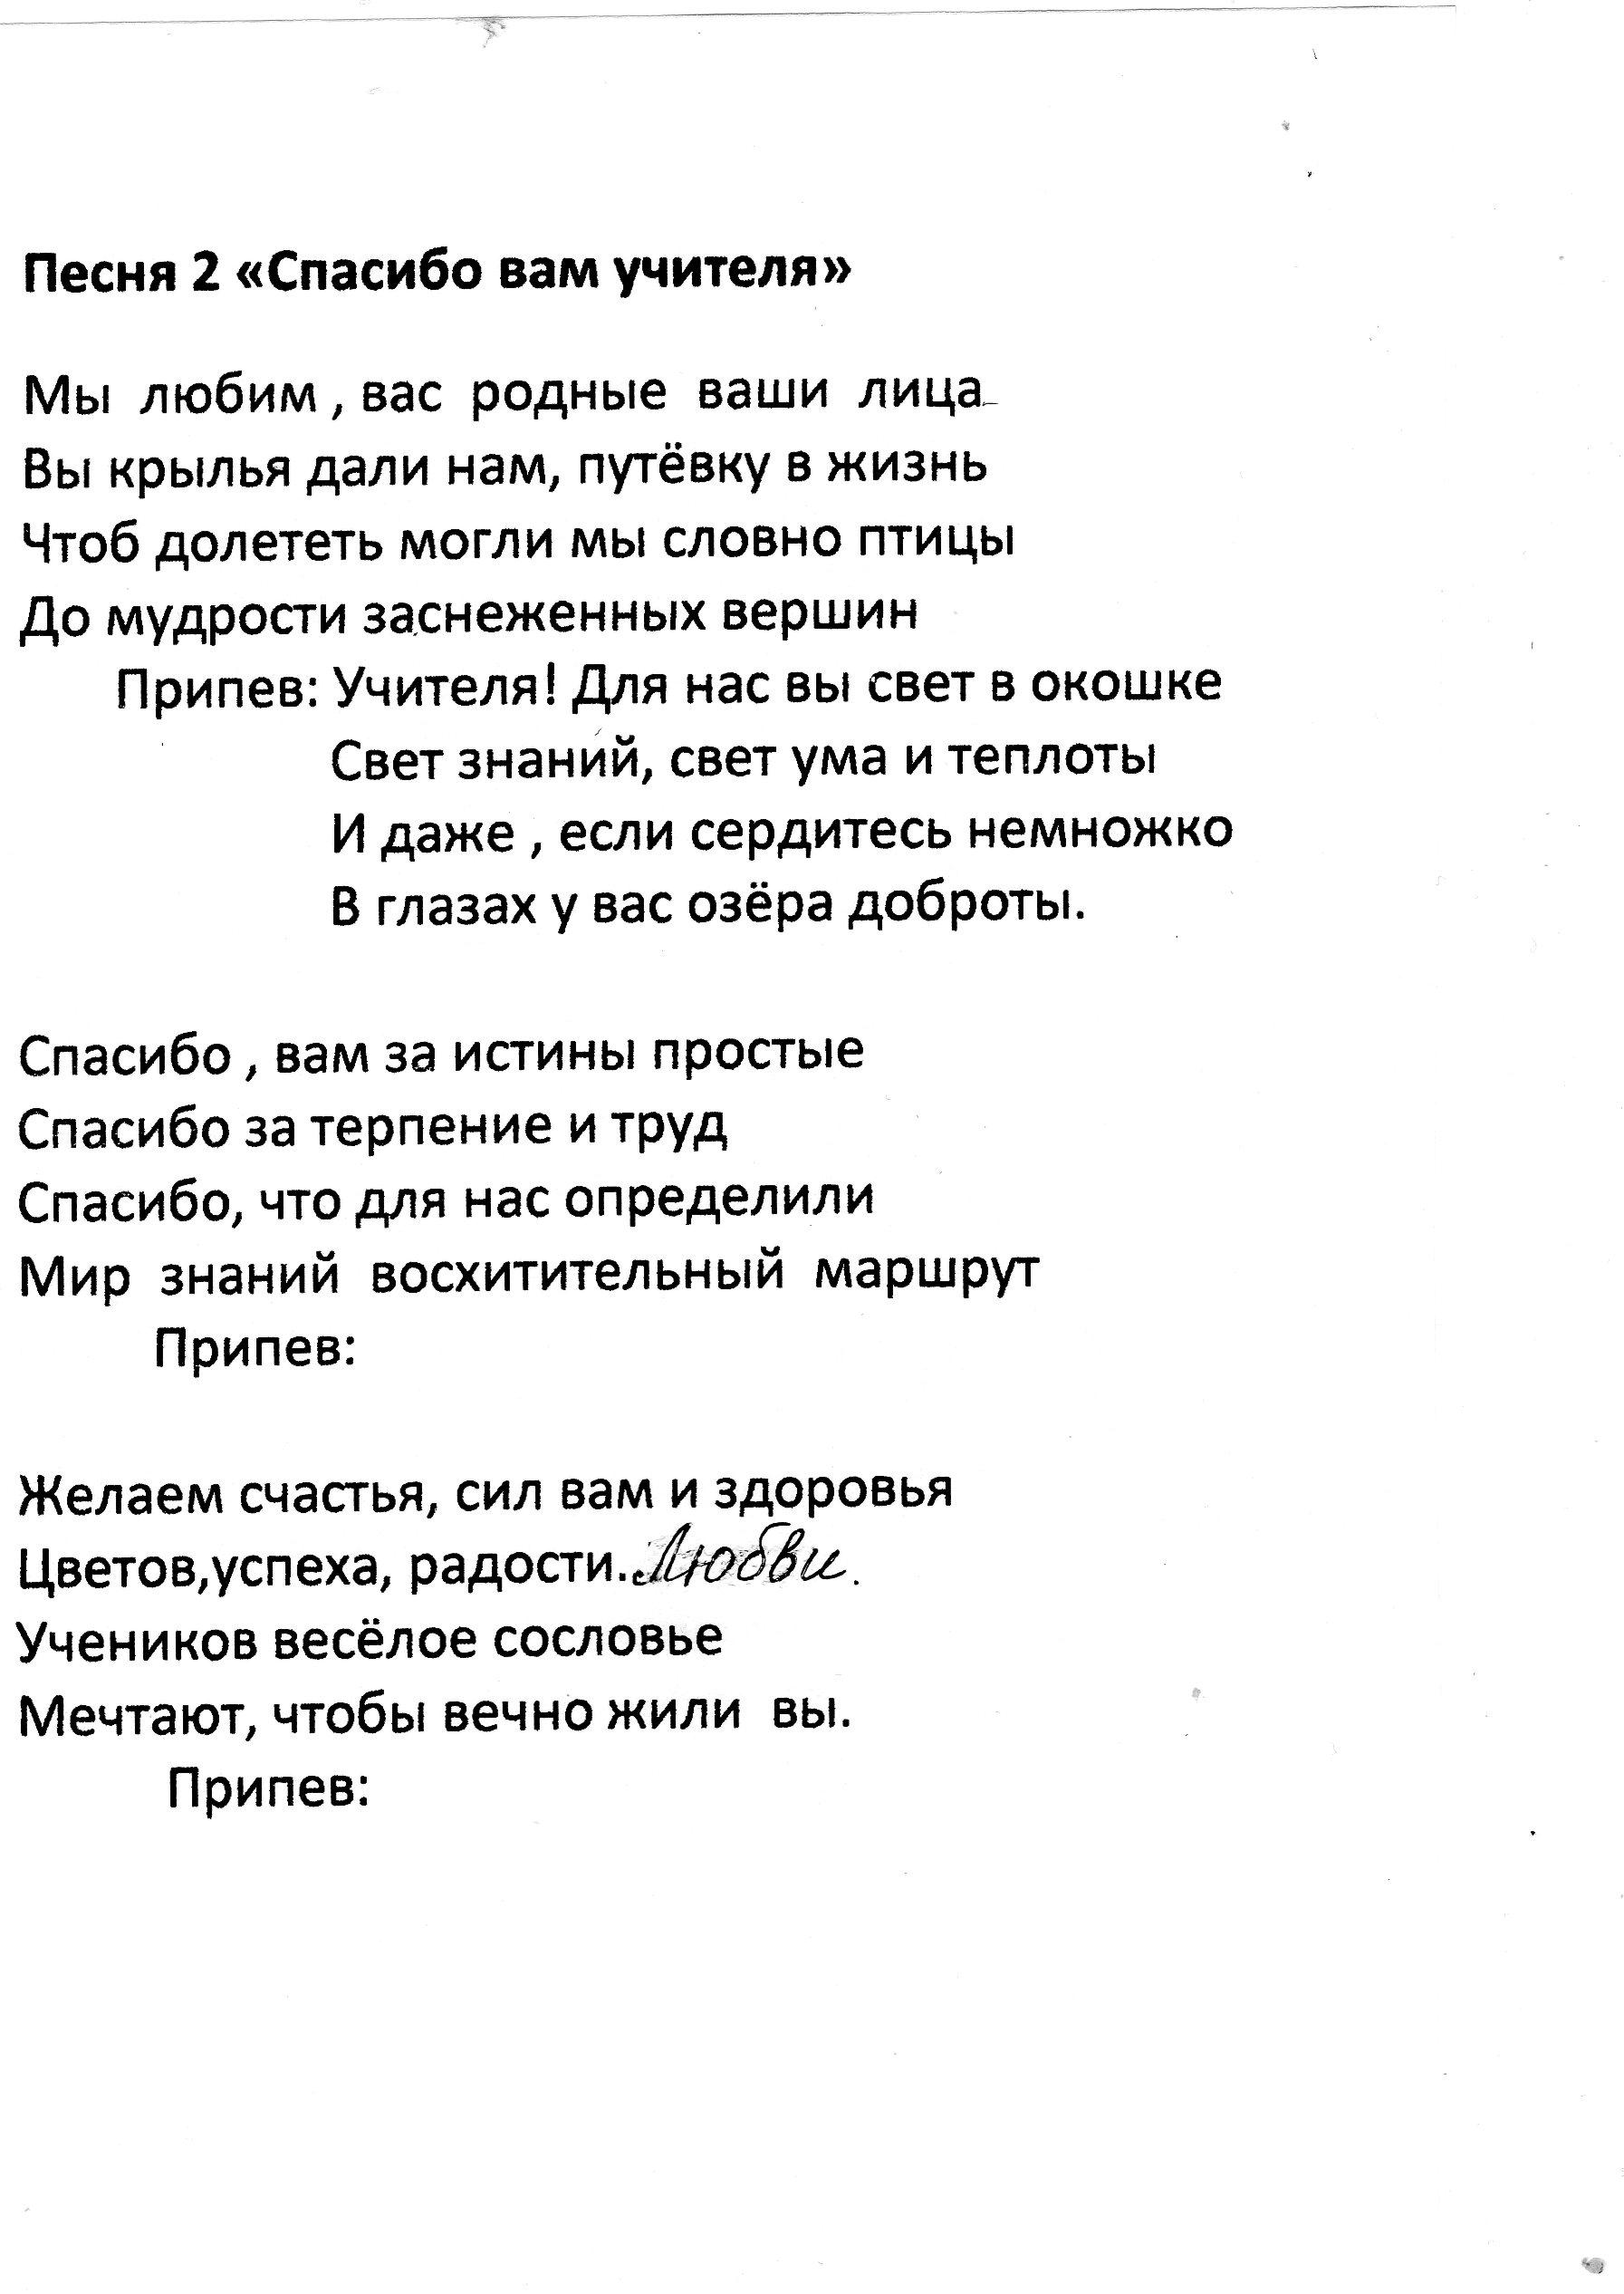 C:\Documents and Settings\ADMIN\Мои документы\Мои рисунки\день учителя\img047.jpg